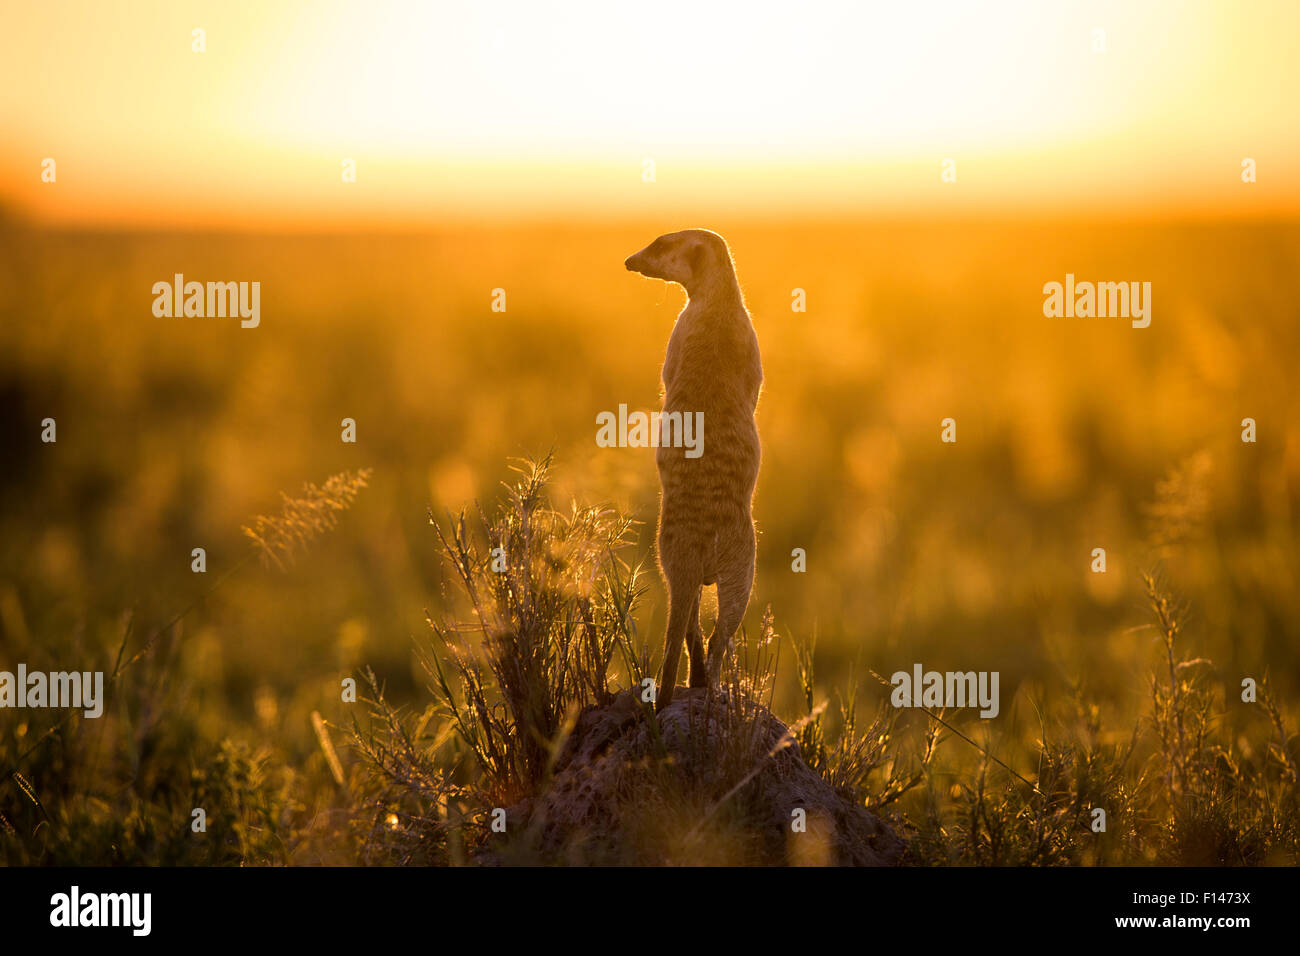 Meerkat (Suricata suricatta) standing alert on hind legs. Makgadikgadi Pans, Botswana. - Stock Image